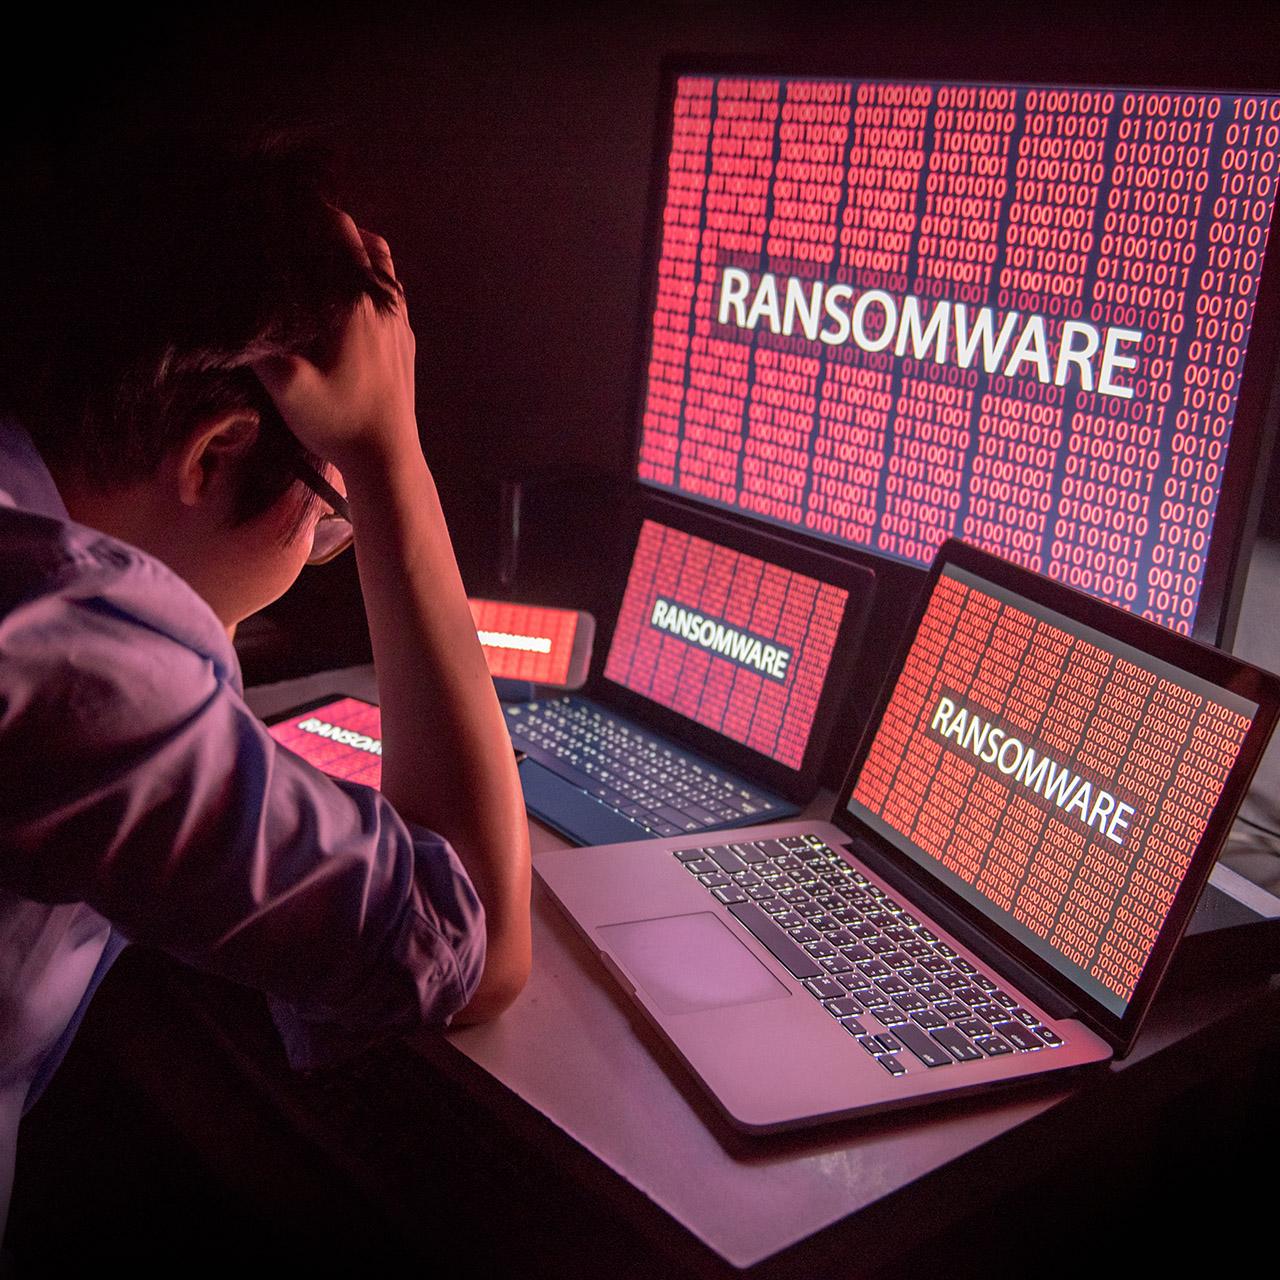 ransomware attack priorities